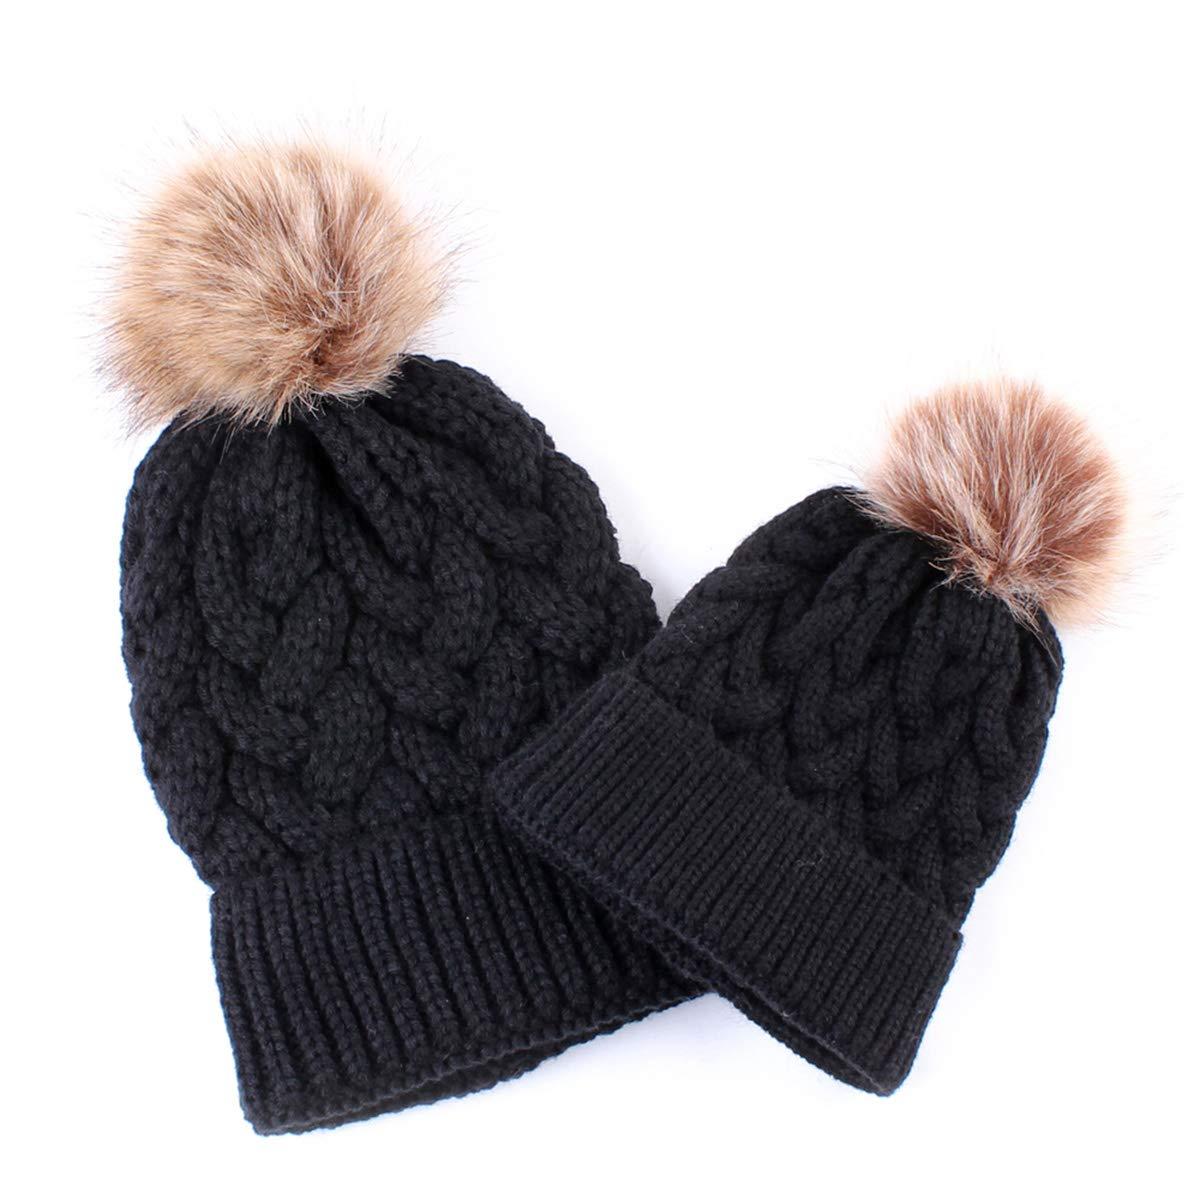 30d9165e46cdc 2PCS Mother Baby Hat Family Matching Cap Winter Warmer Knit Wool Beanie Ski  Cap (Black)  Amazon.co.uk  Clothing